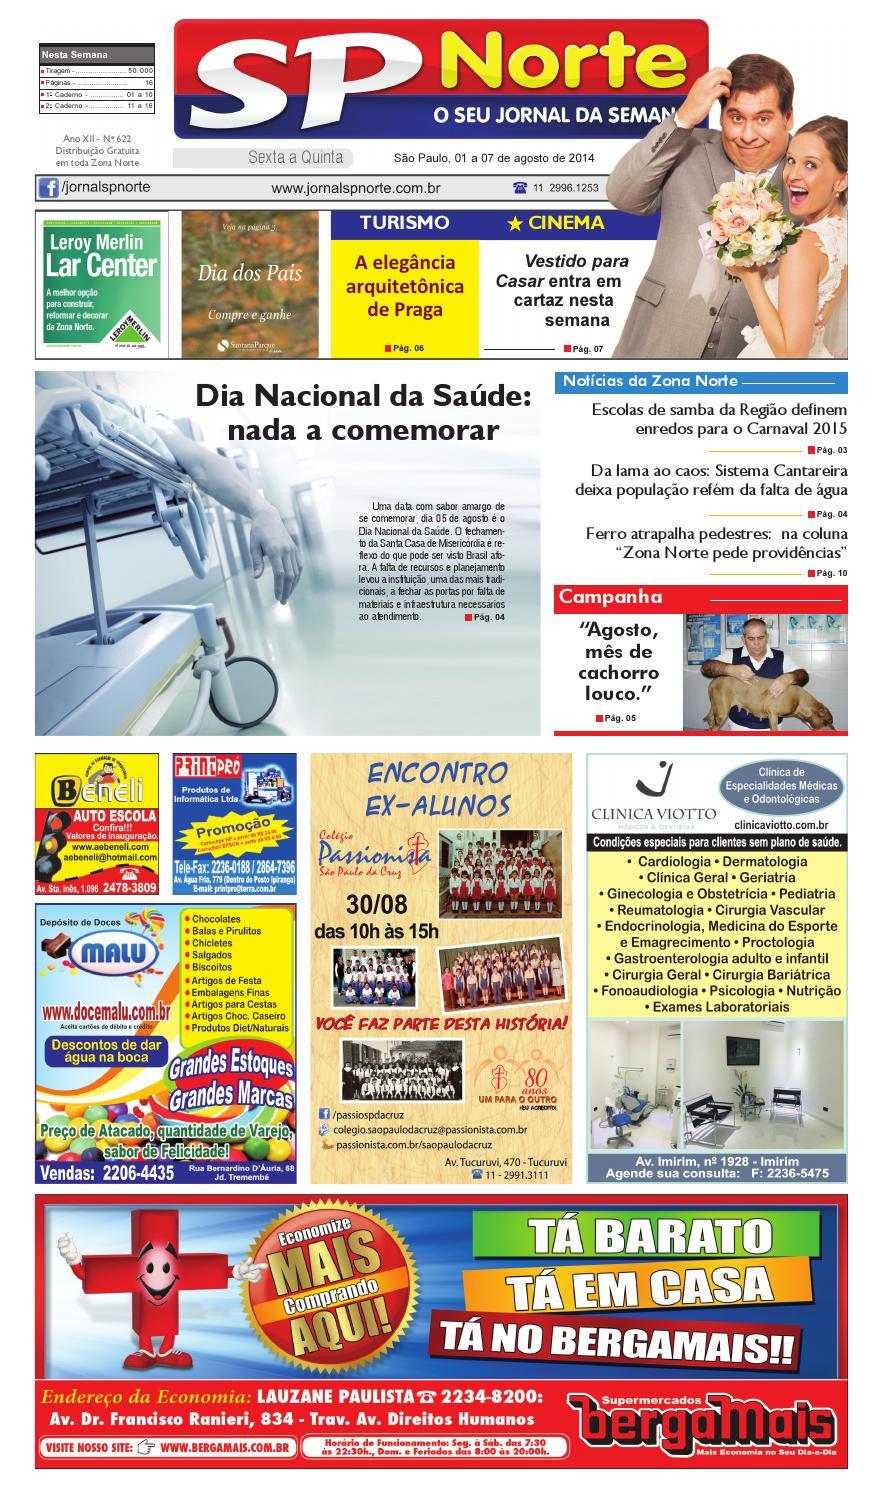 53c0d0cdbf60c Jornal SP Norte 622 by Grupo SP de jornais - issuu